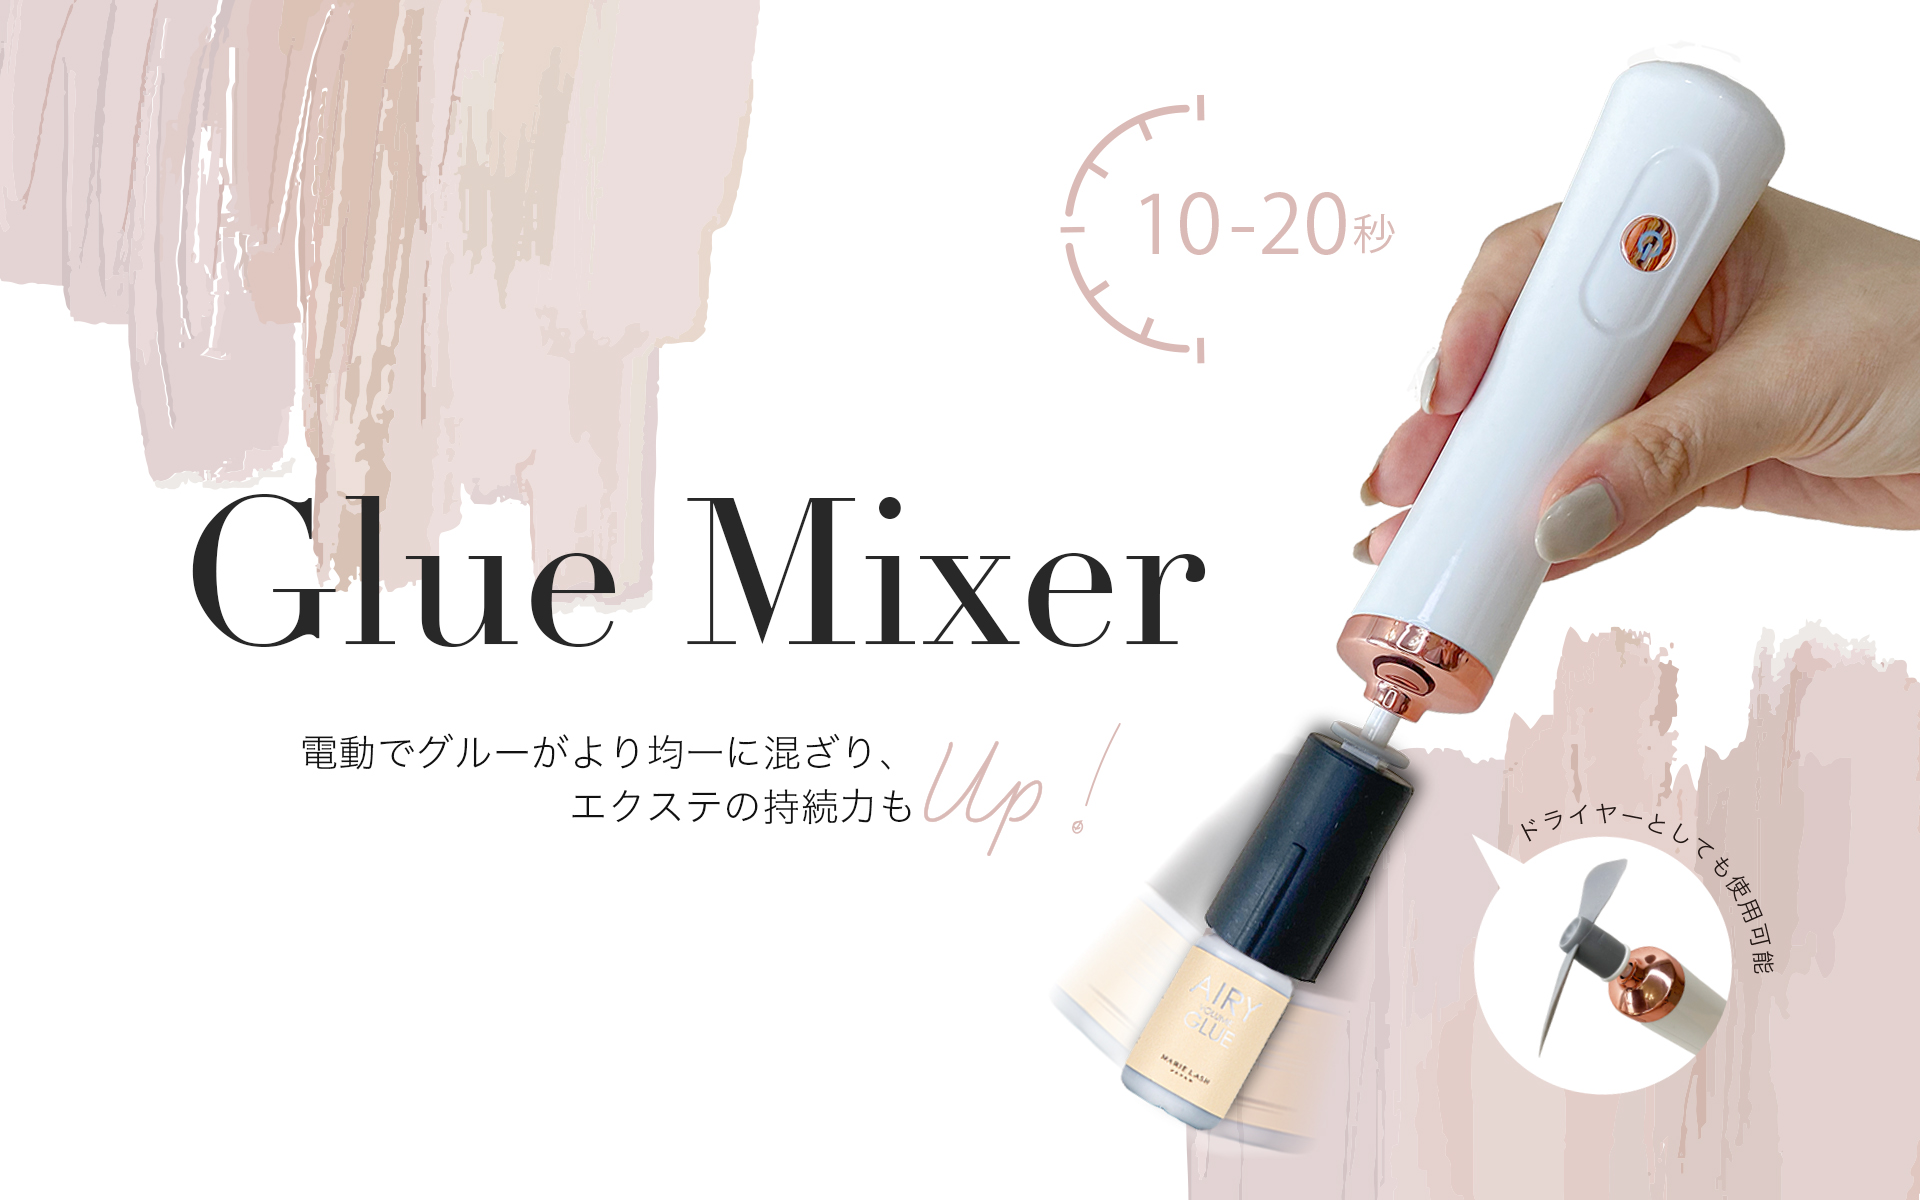 MARIE LASH JAPAN new eyelash extensions glue mixer banner